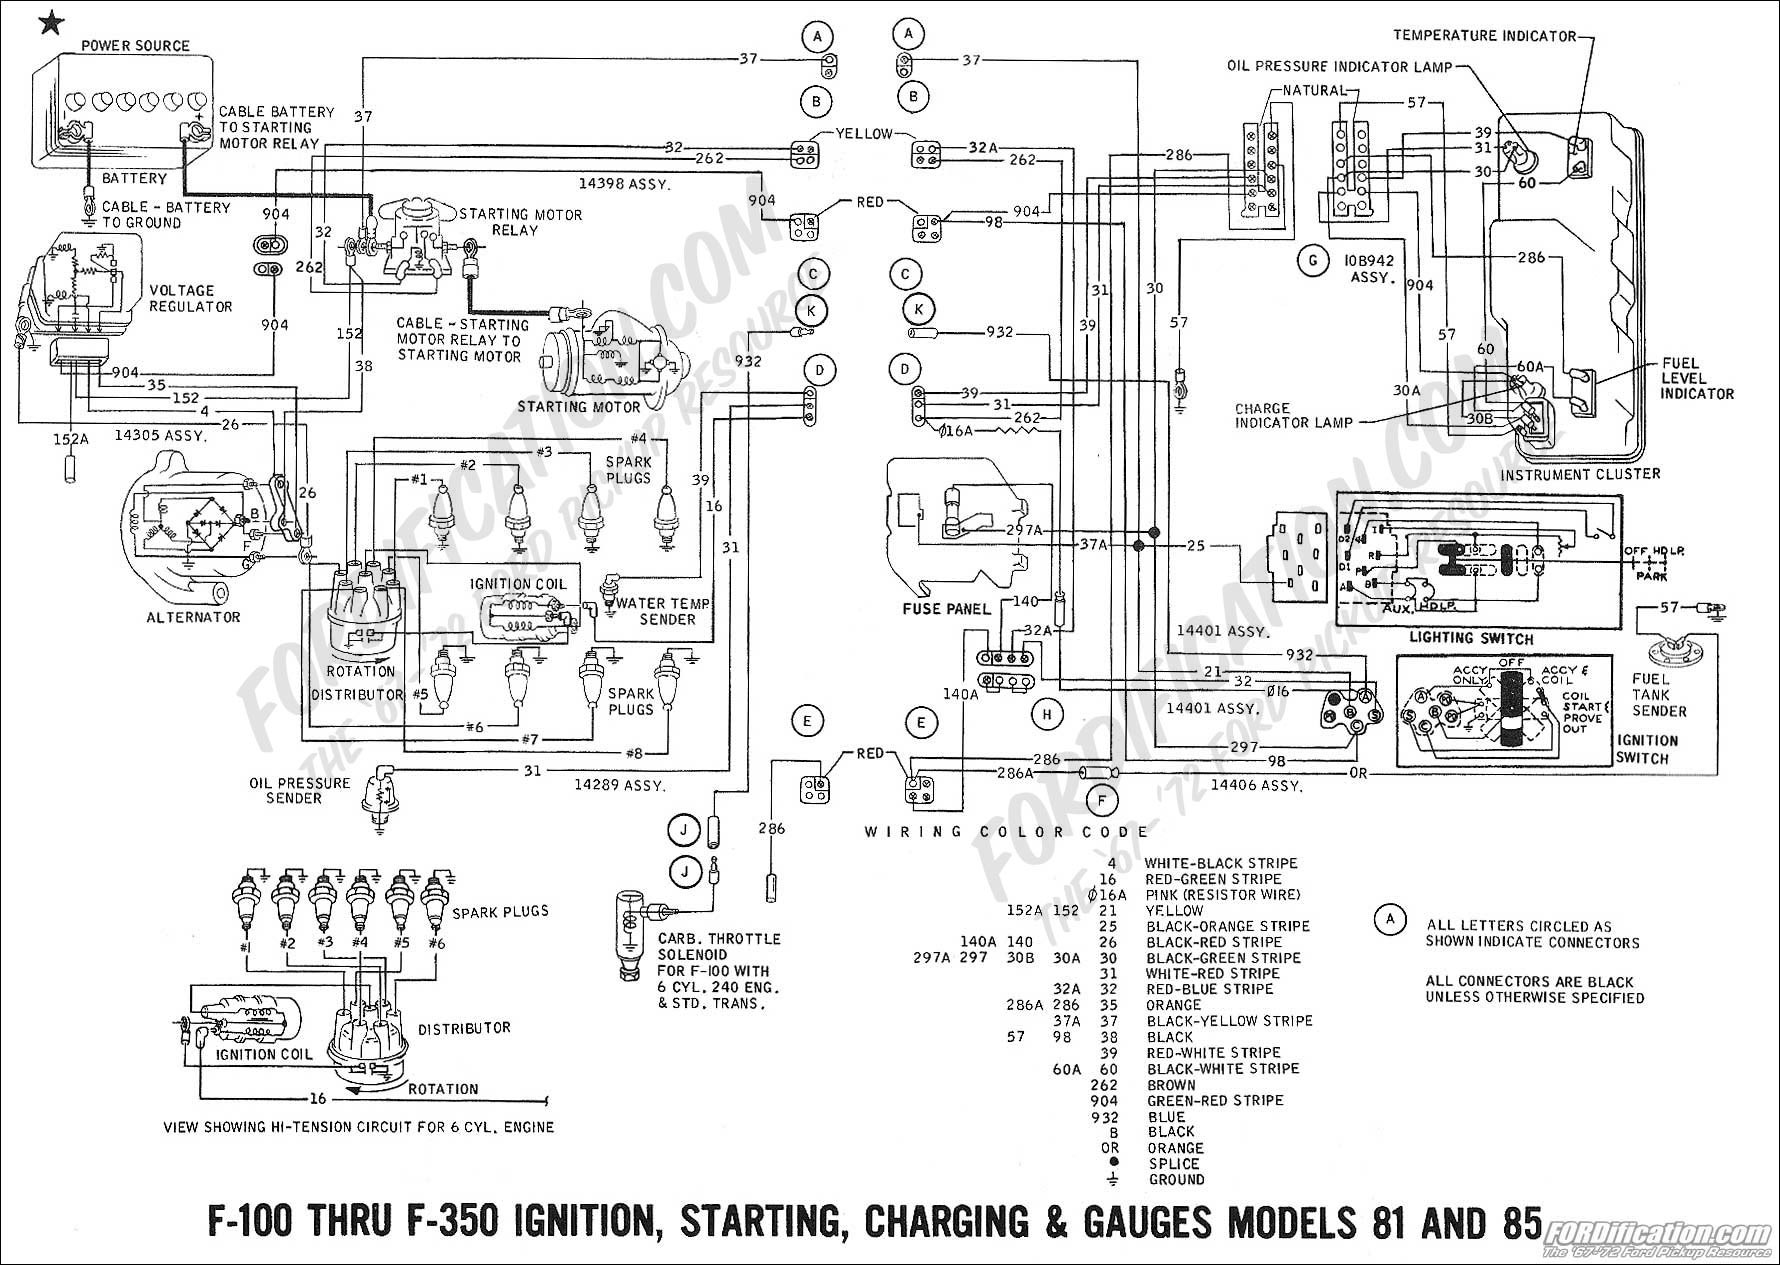 Honda 70 Engine Diagram Dodge Wiring Free Download Diagrams Iwak Kutok Saturn Sl1 Info Of